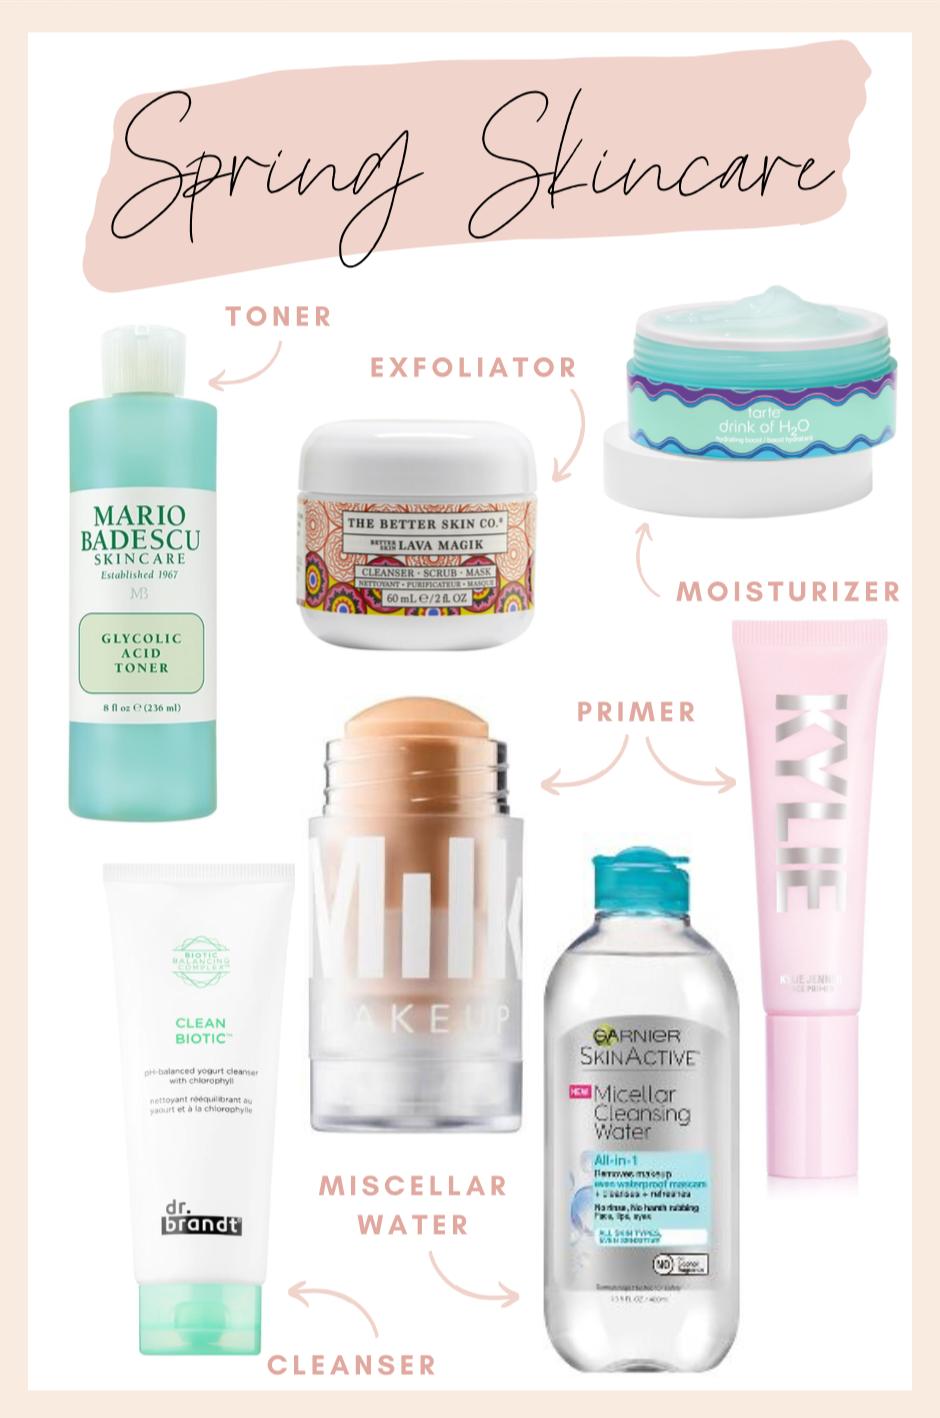 Spring Morning Skincare Routine In 2020 Morning Skin Care Routine Morning Skincare Spring Skin Care